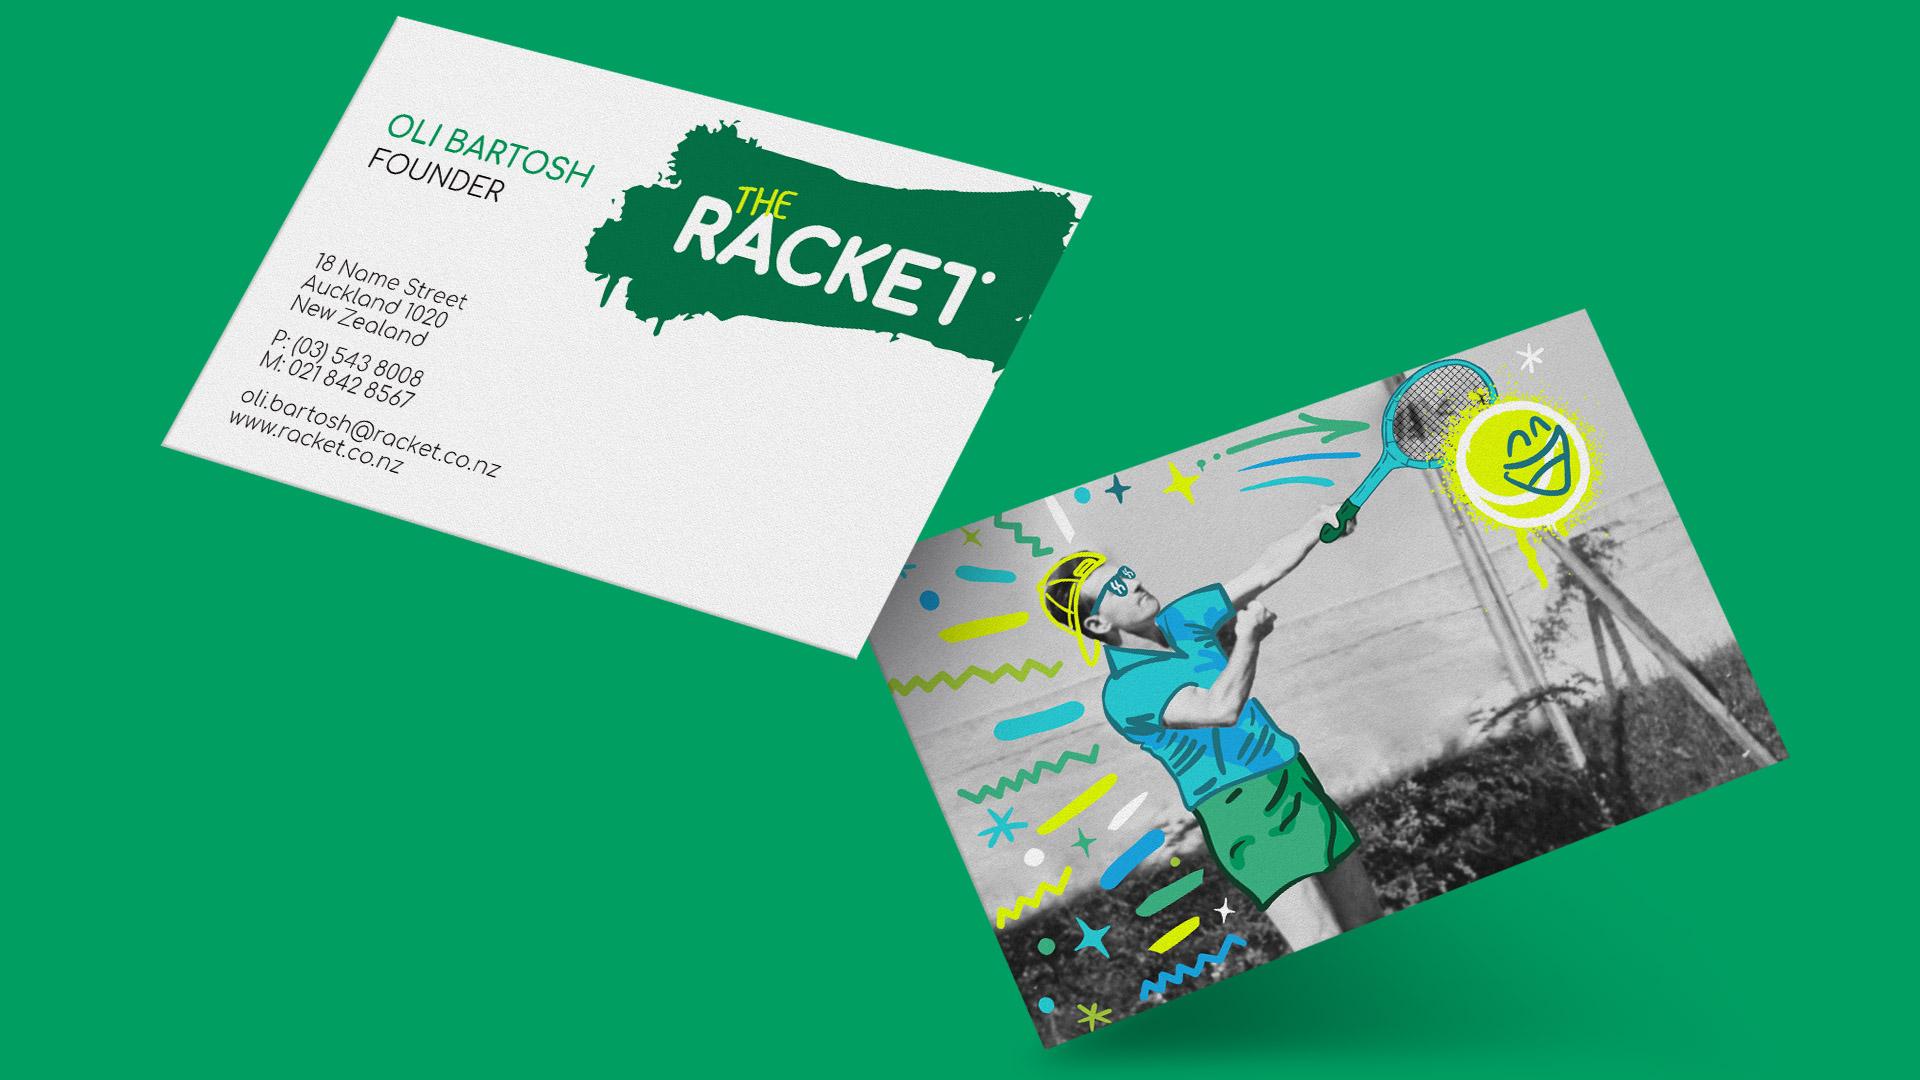 The Racket Image 4